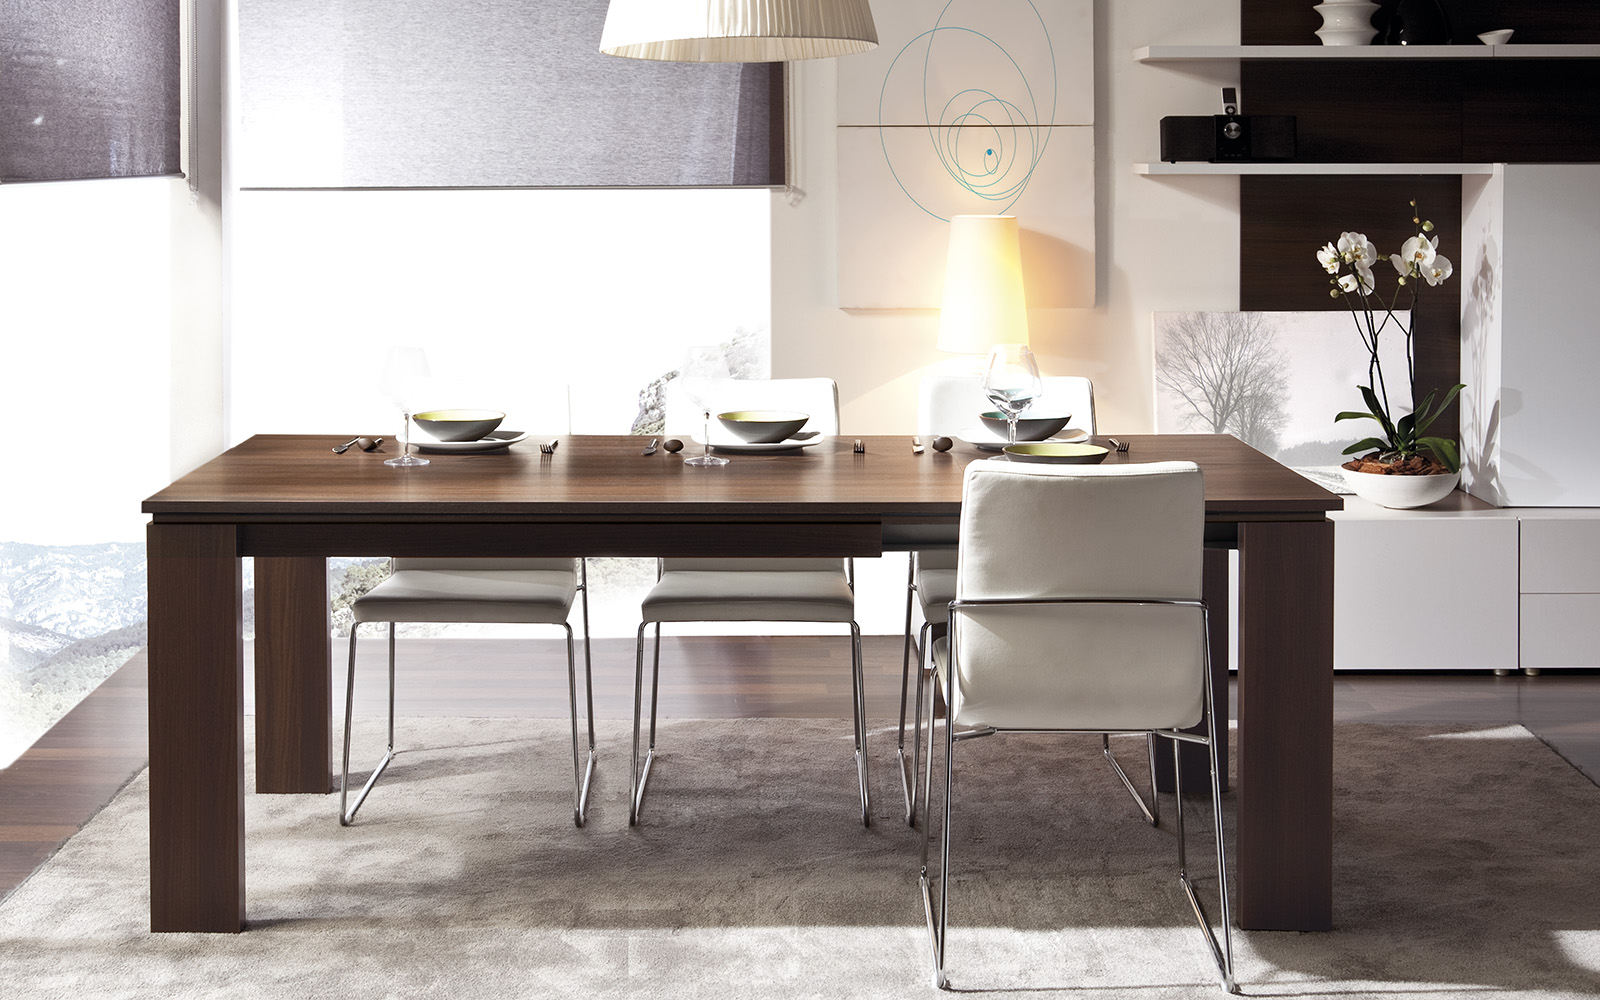 Mesa de comedor ferpi muebles for Muebles de comedor mesas